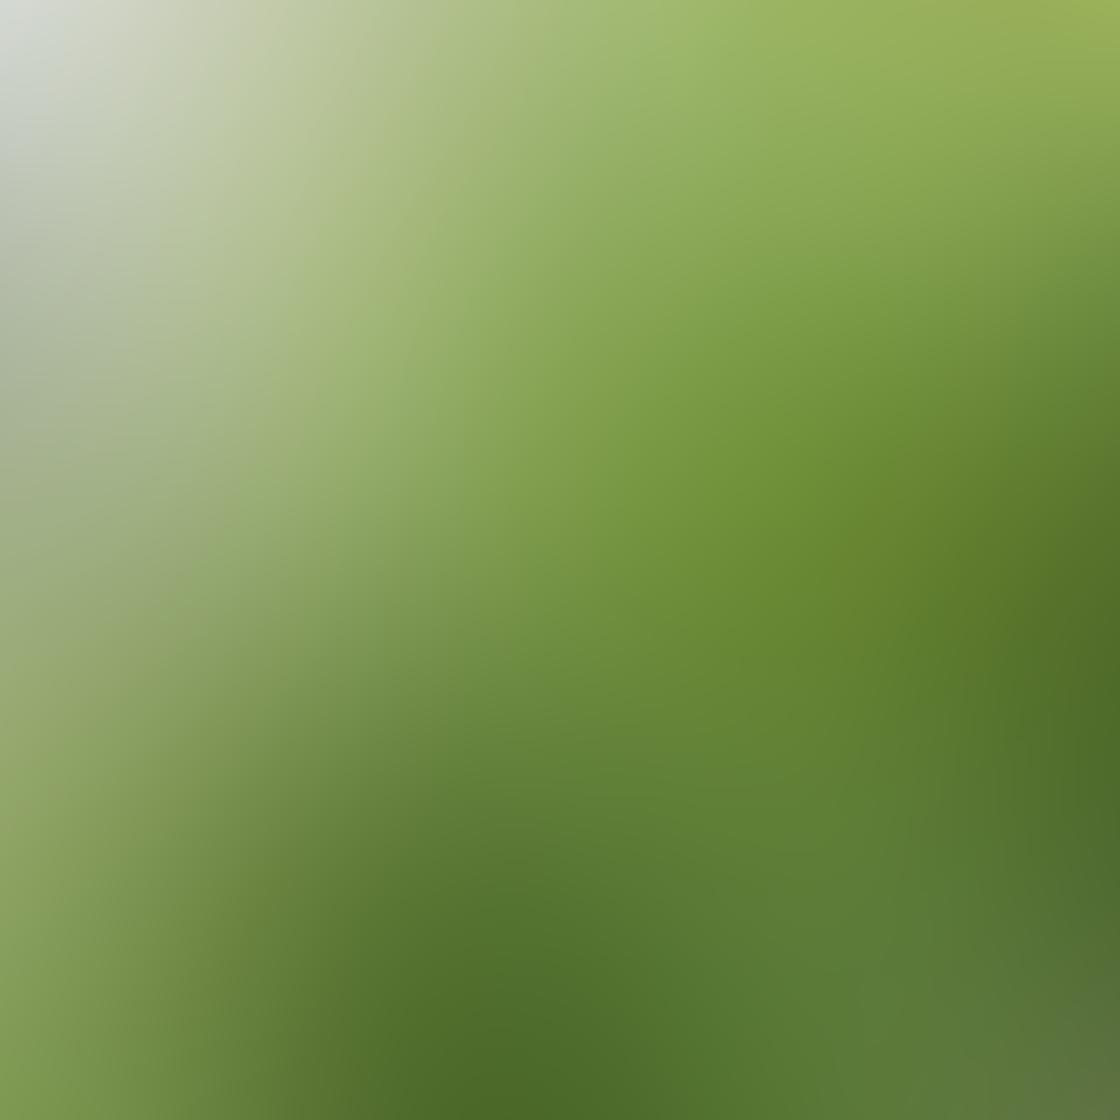 Common iPhone Photo Mistakes 26